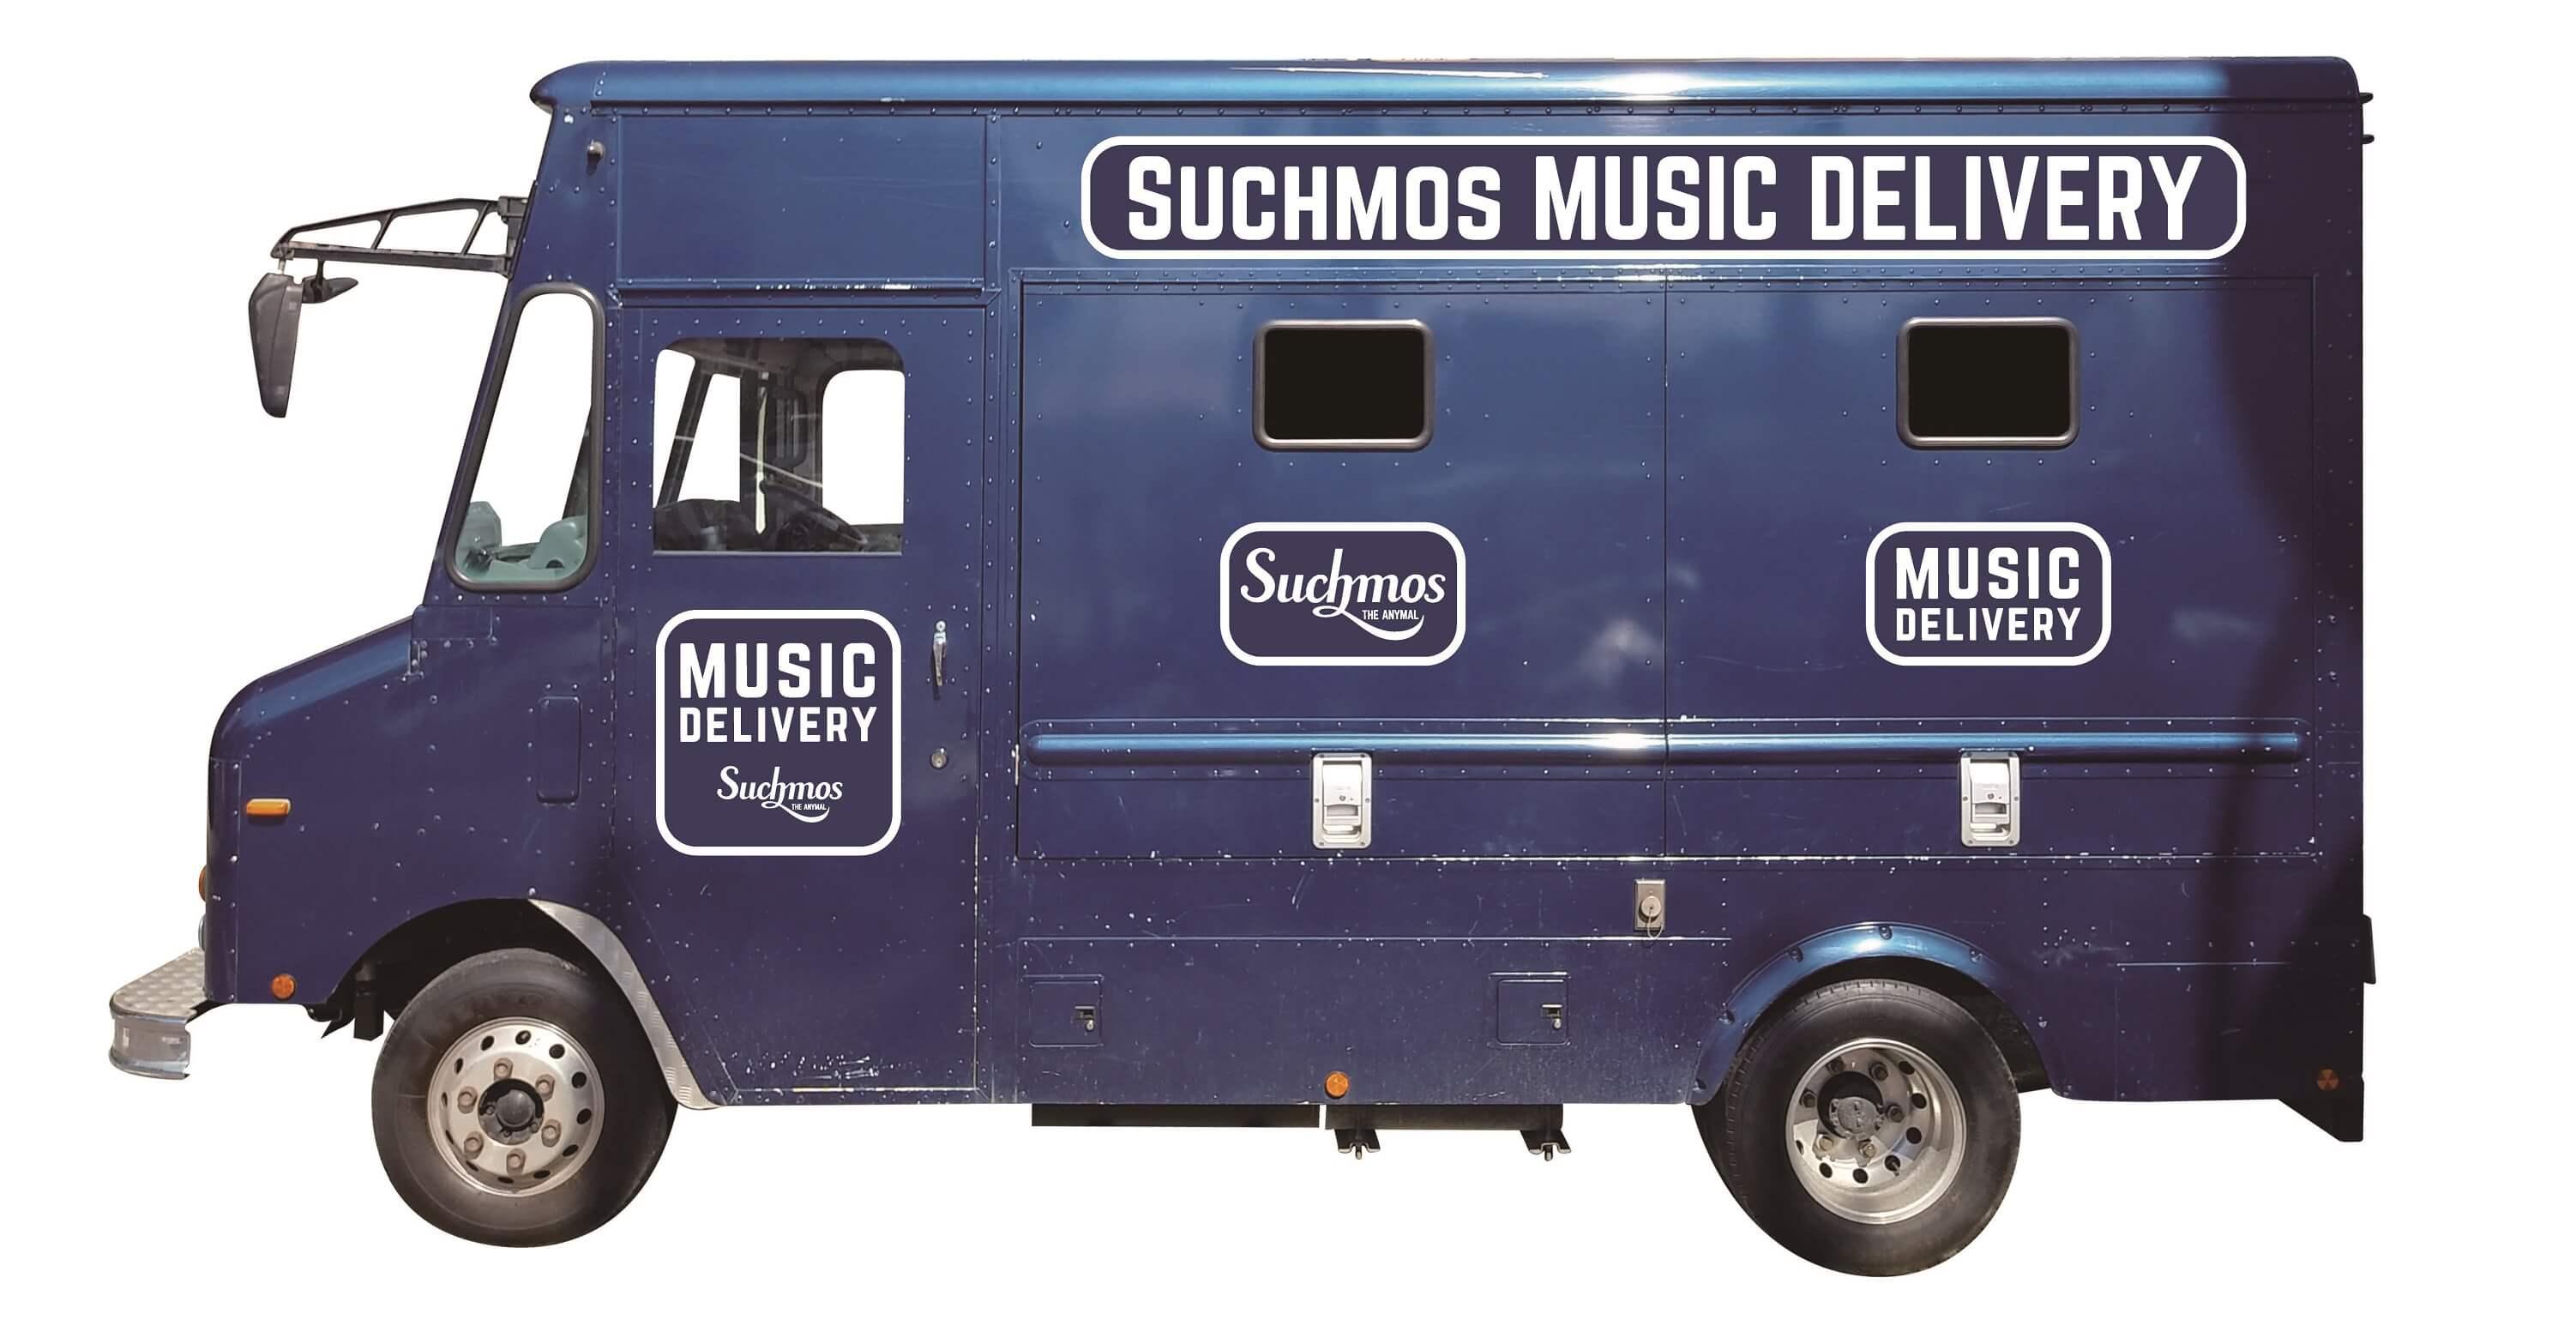 Suchmos_MUSIC DELIVERY_THE ANYMAL_truck_サチモス_ザアニマル_トラック_移動販売_2